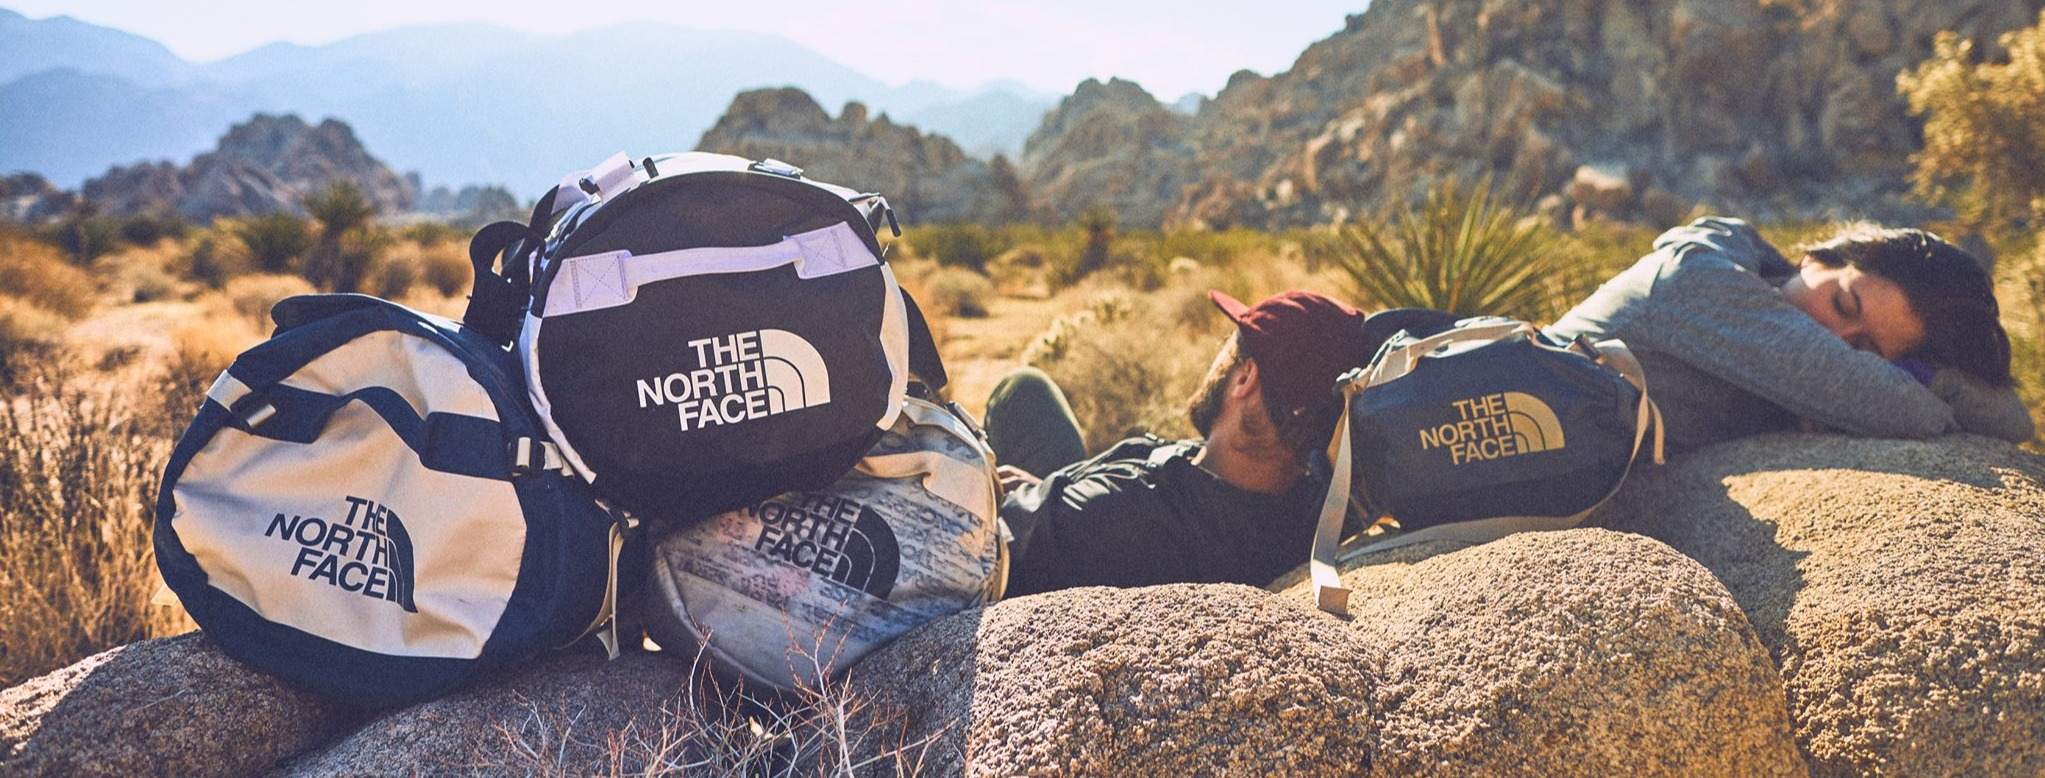 Portada The North Face